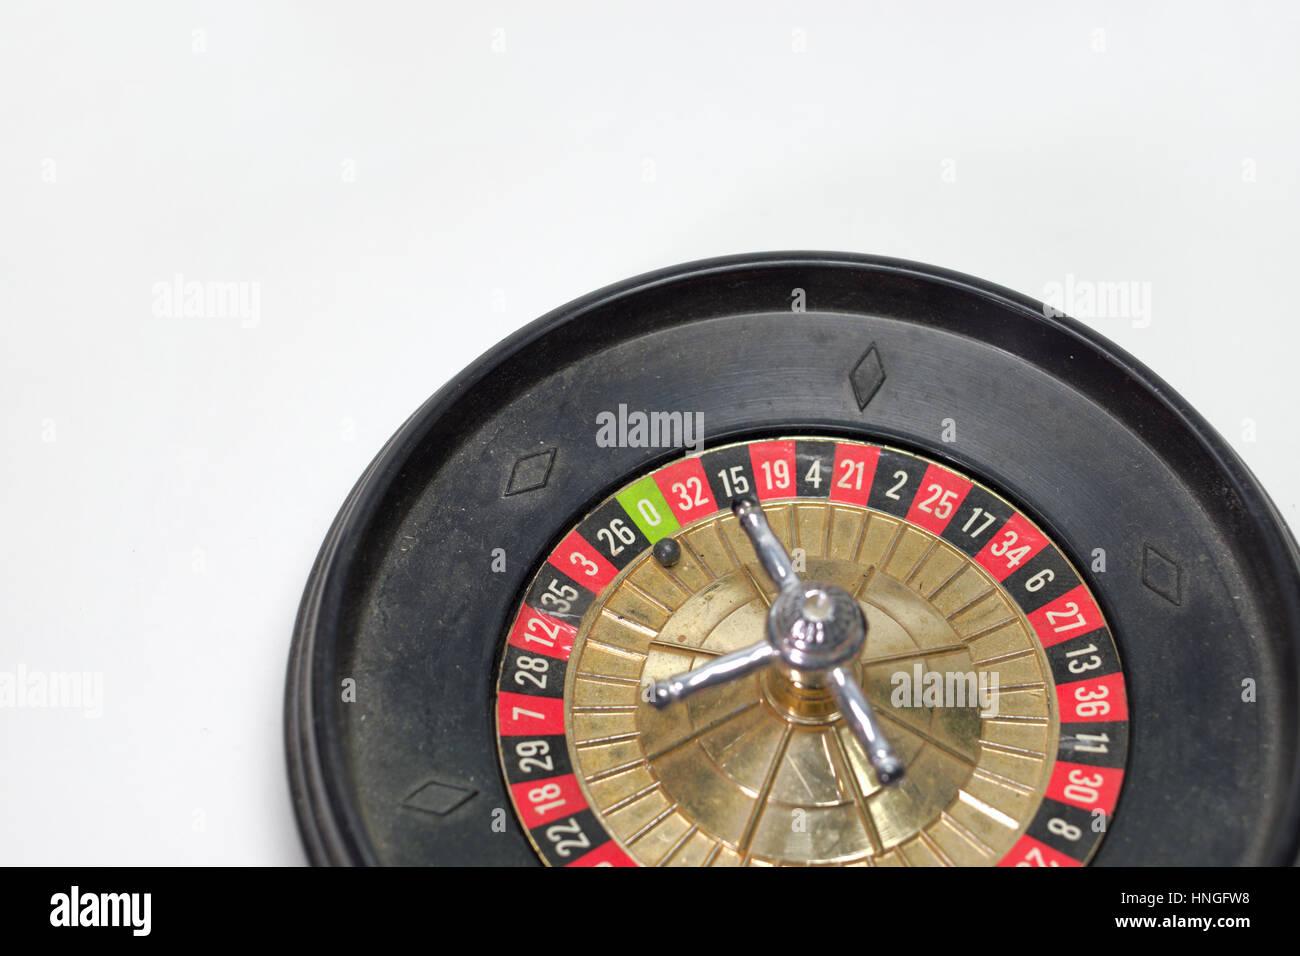 toy roulette wheel for freestanding. zero in focus - Stock Image